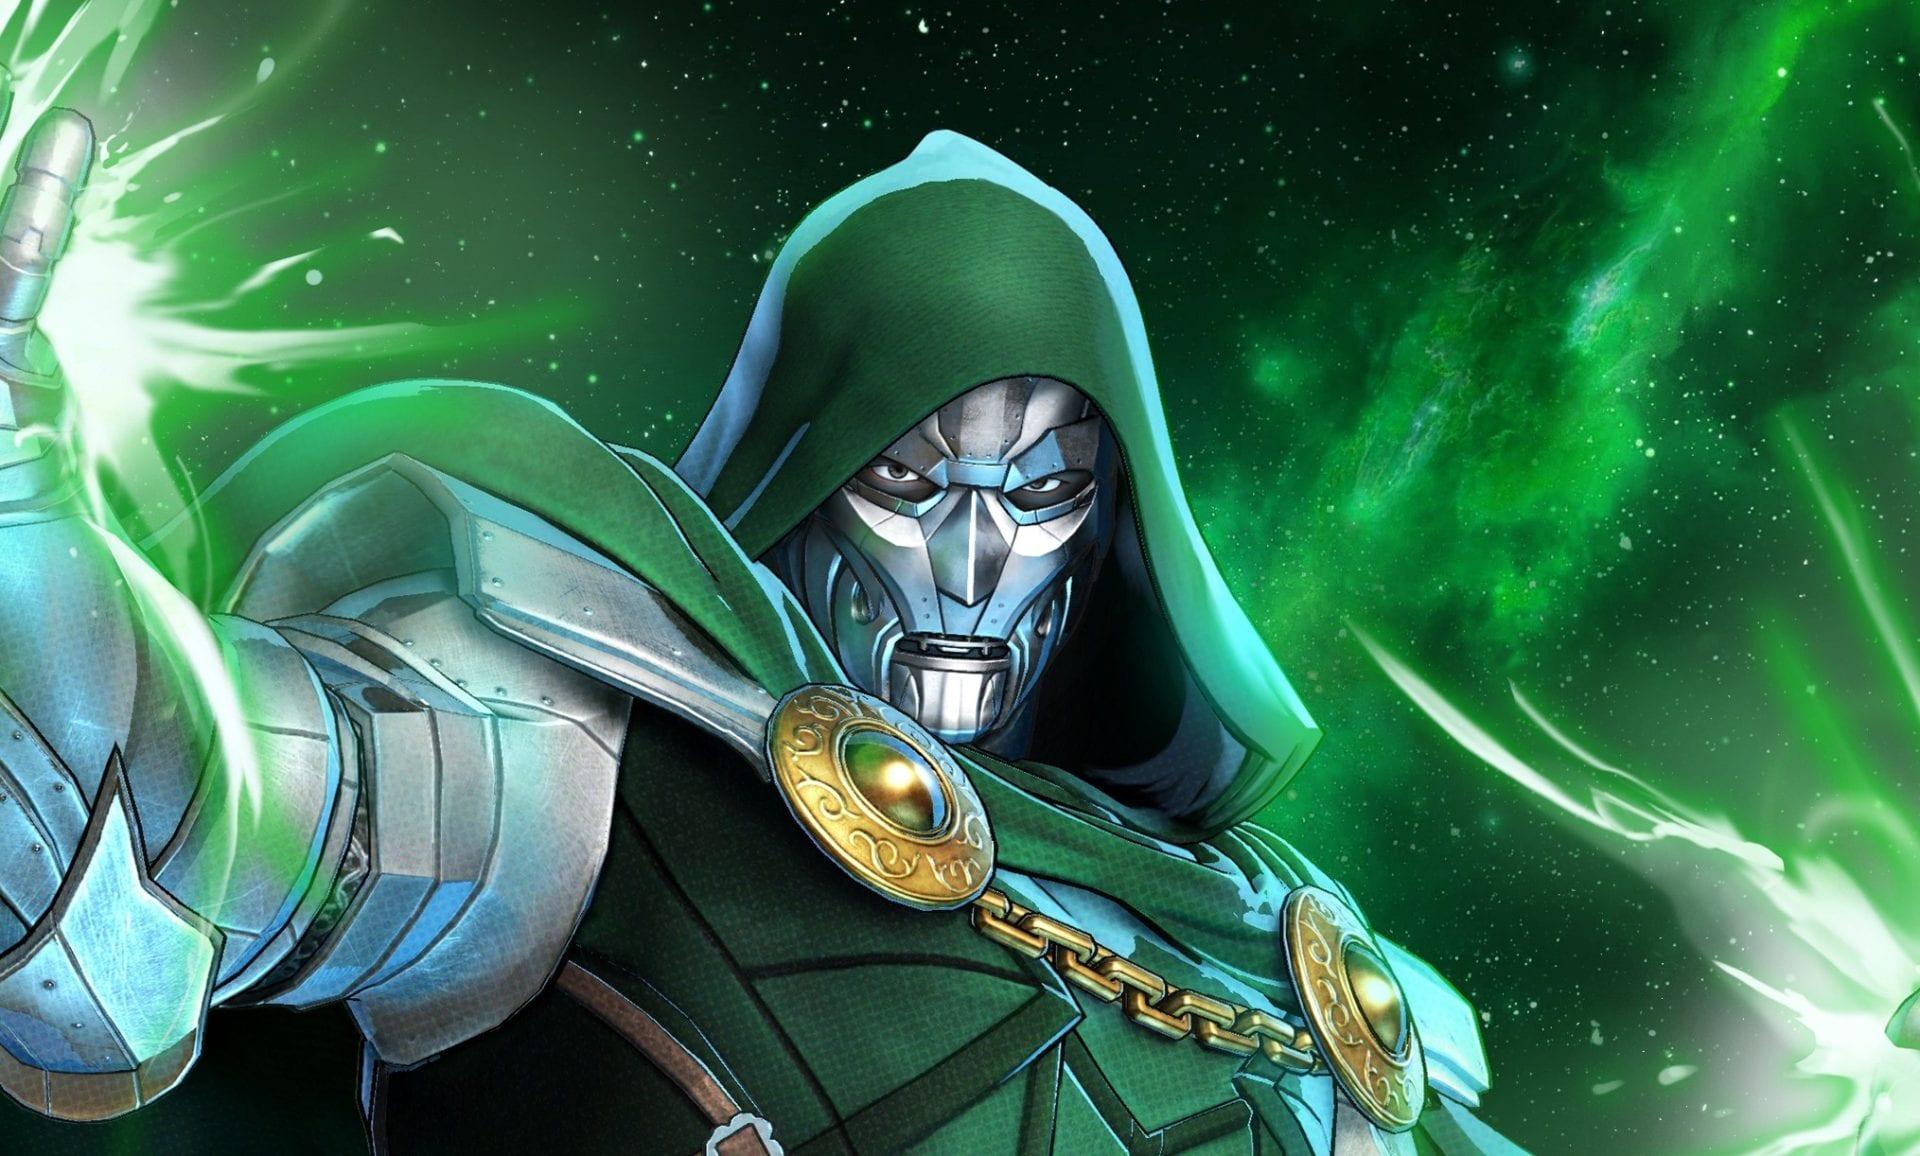 marvel ultimate alliance 3, dlc, expansion pass